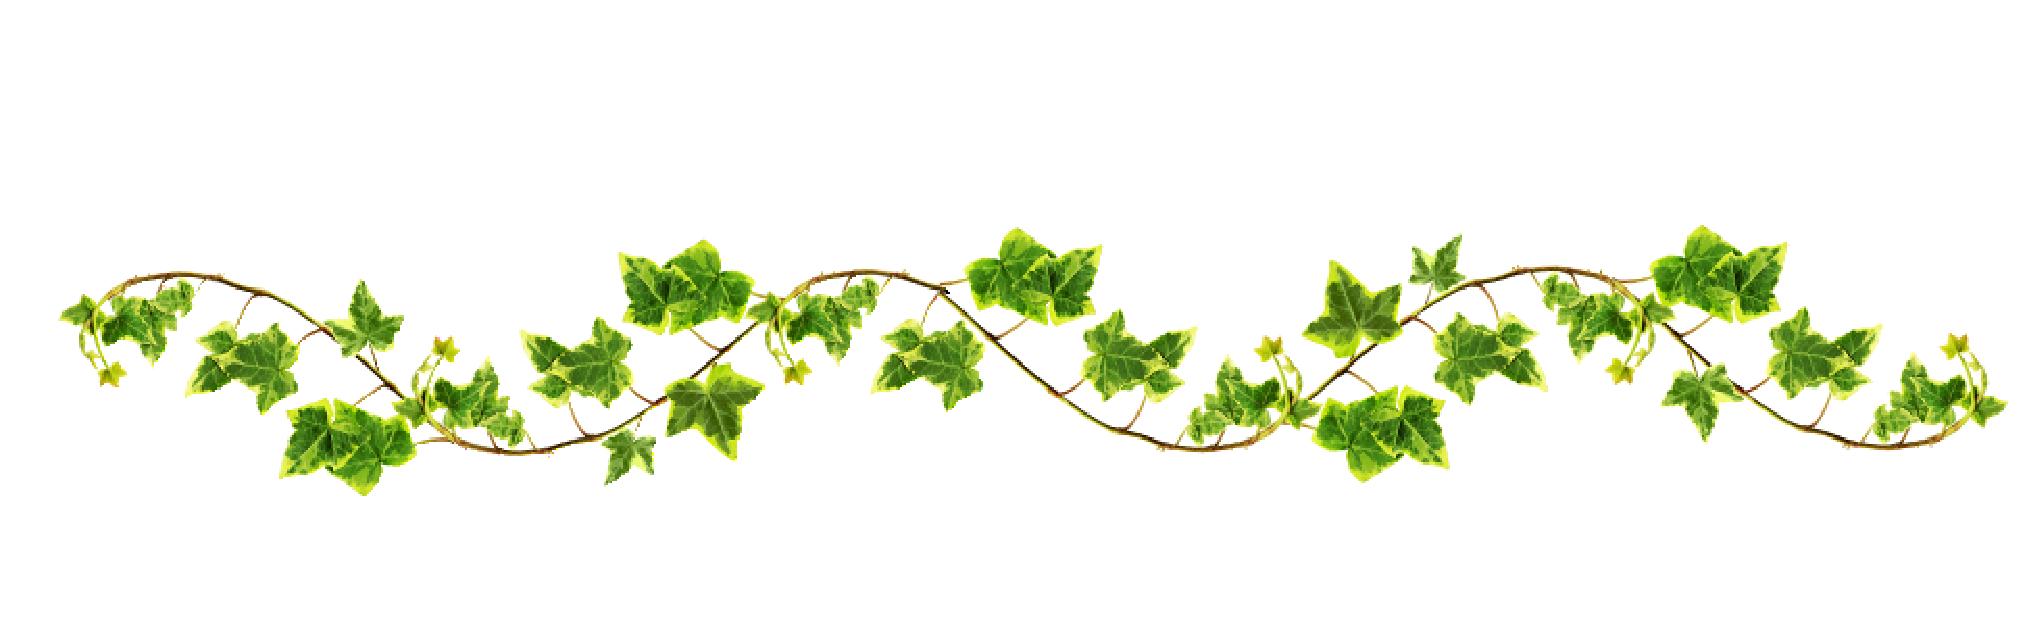 Flower vines png. Devotional